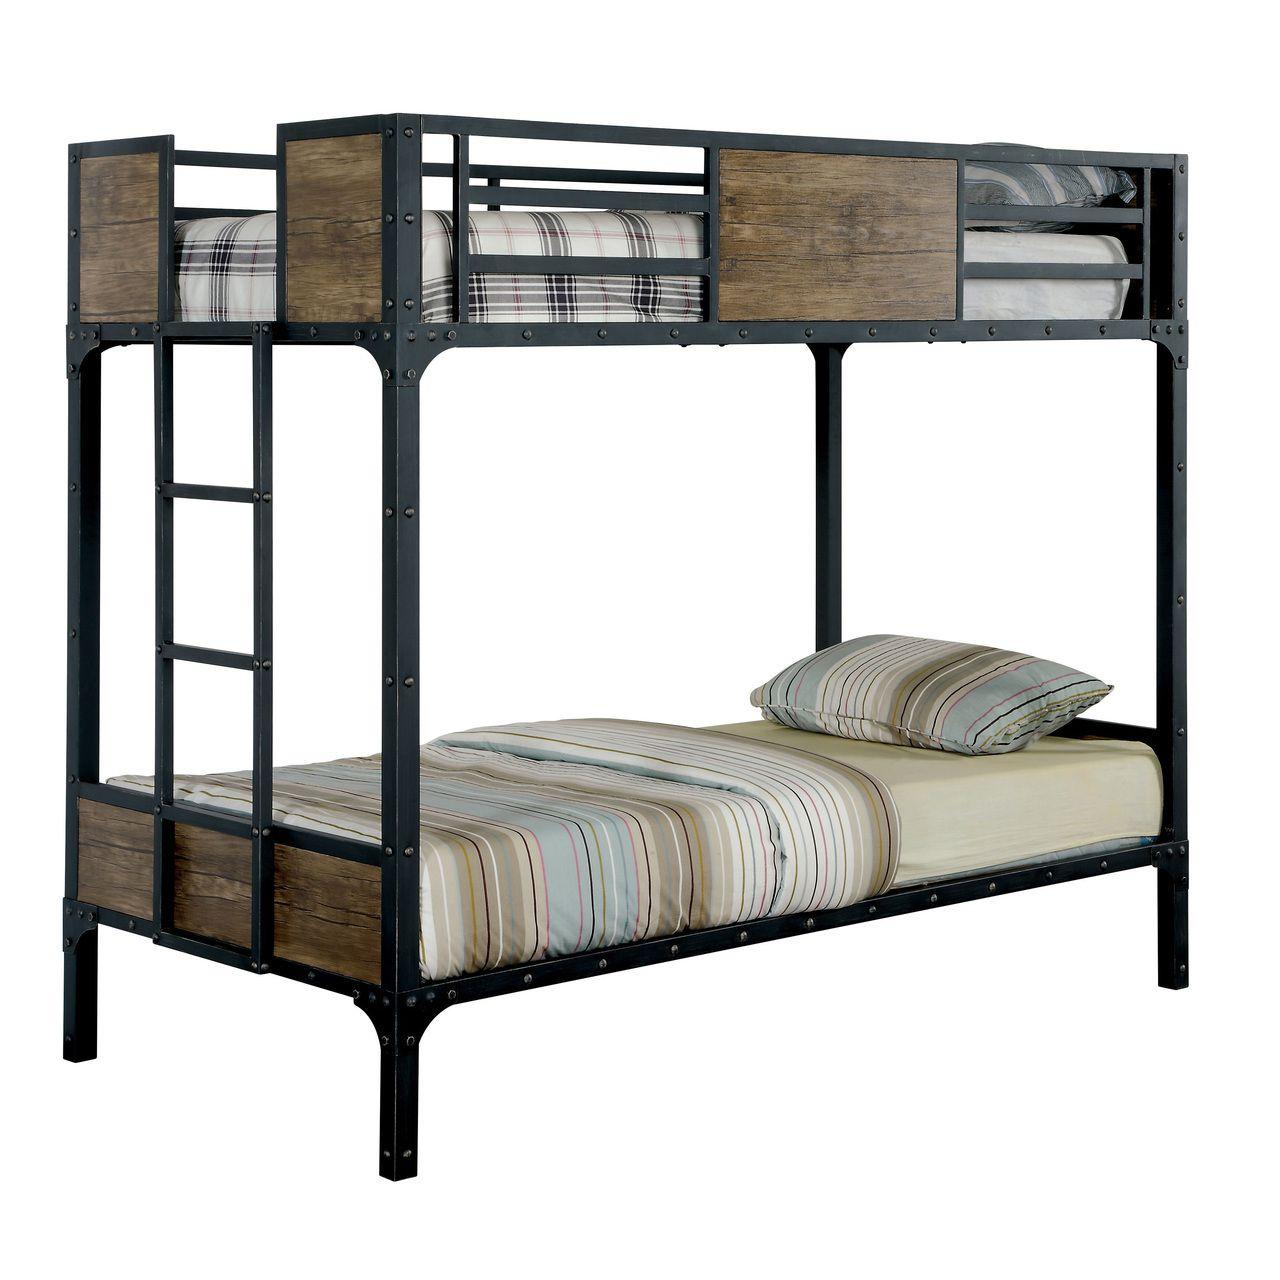 Furniture of America Industrial Metal Wood Twin over Twin Bunk Bed